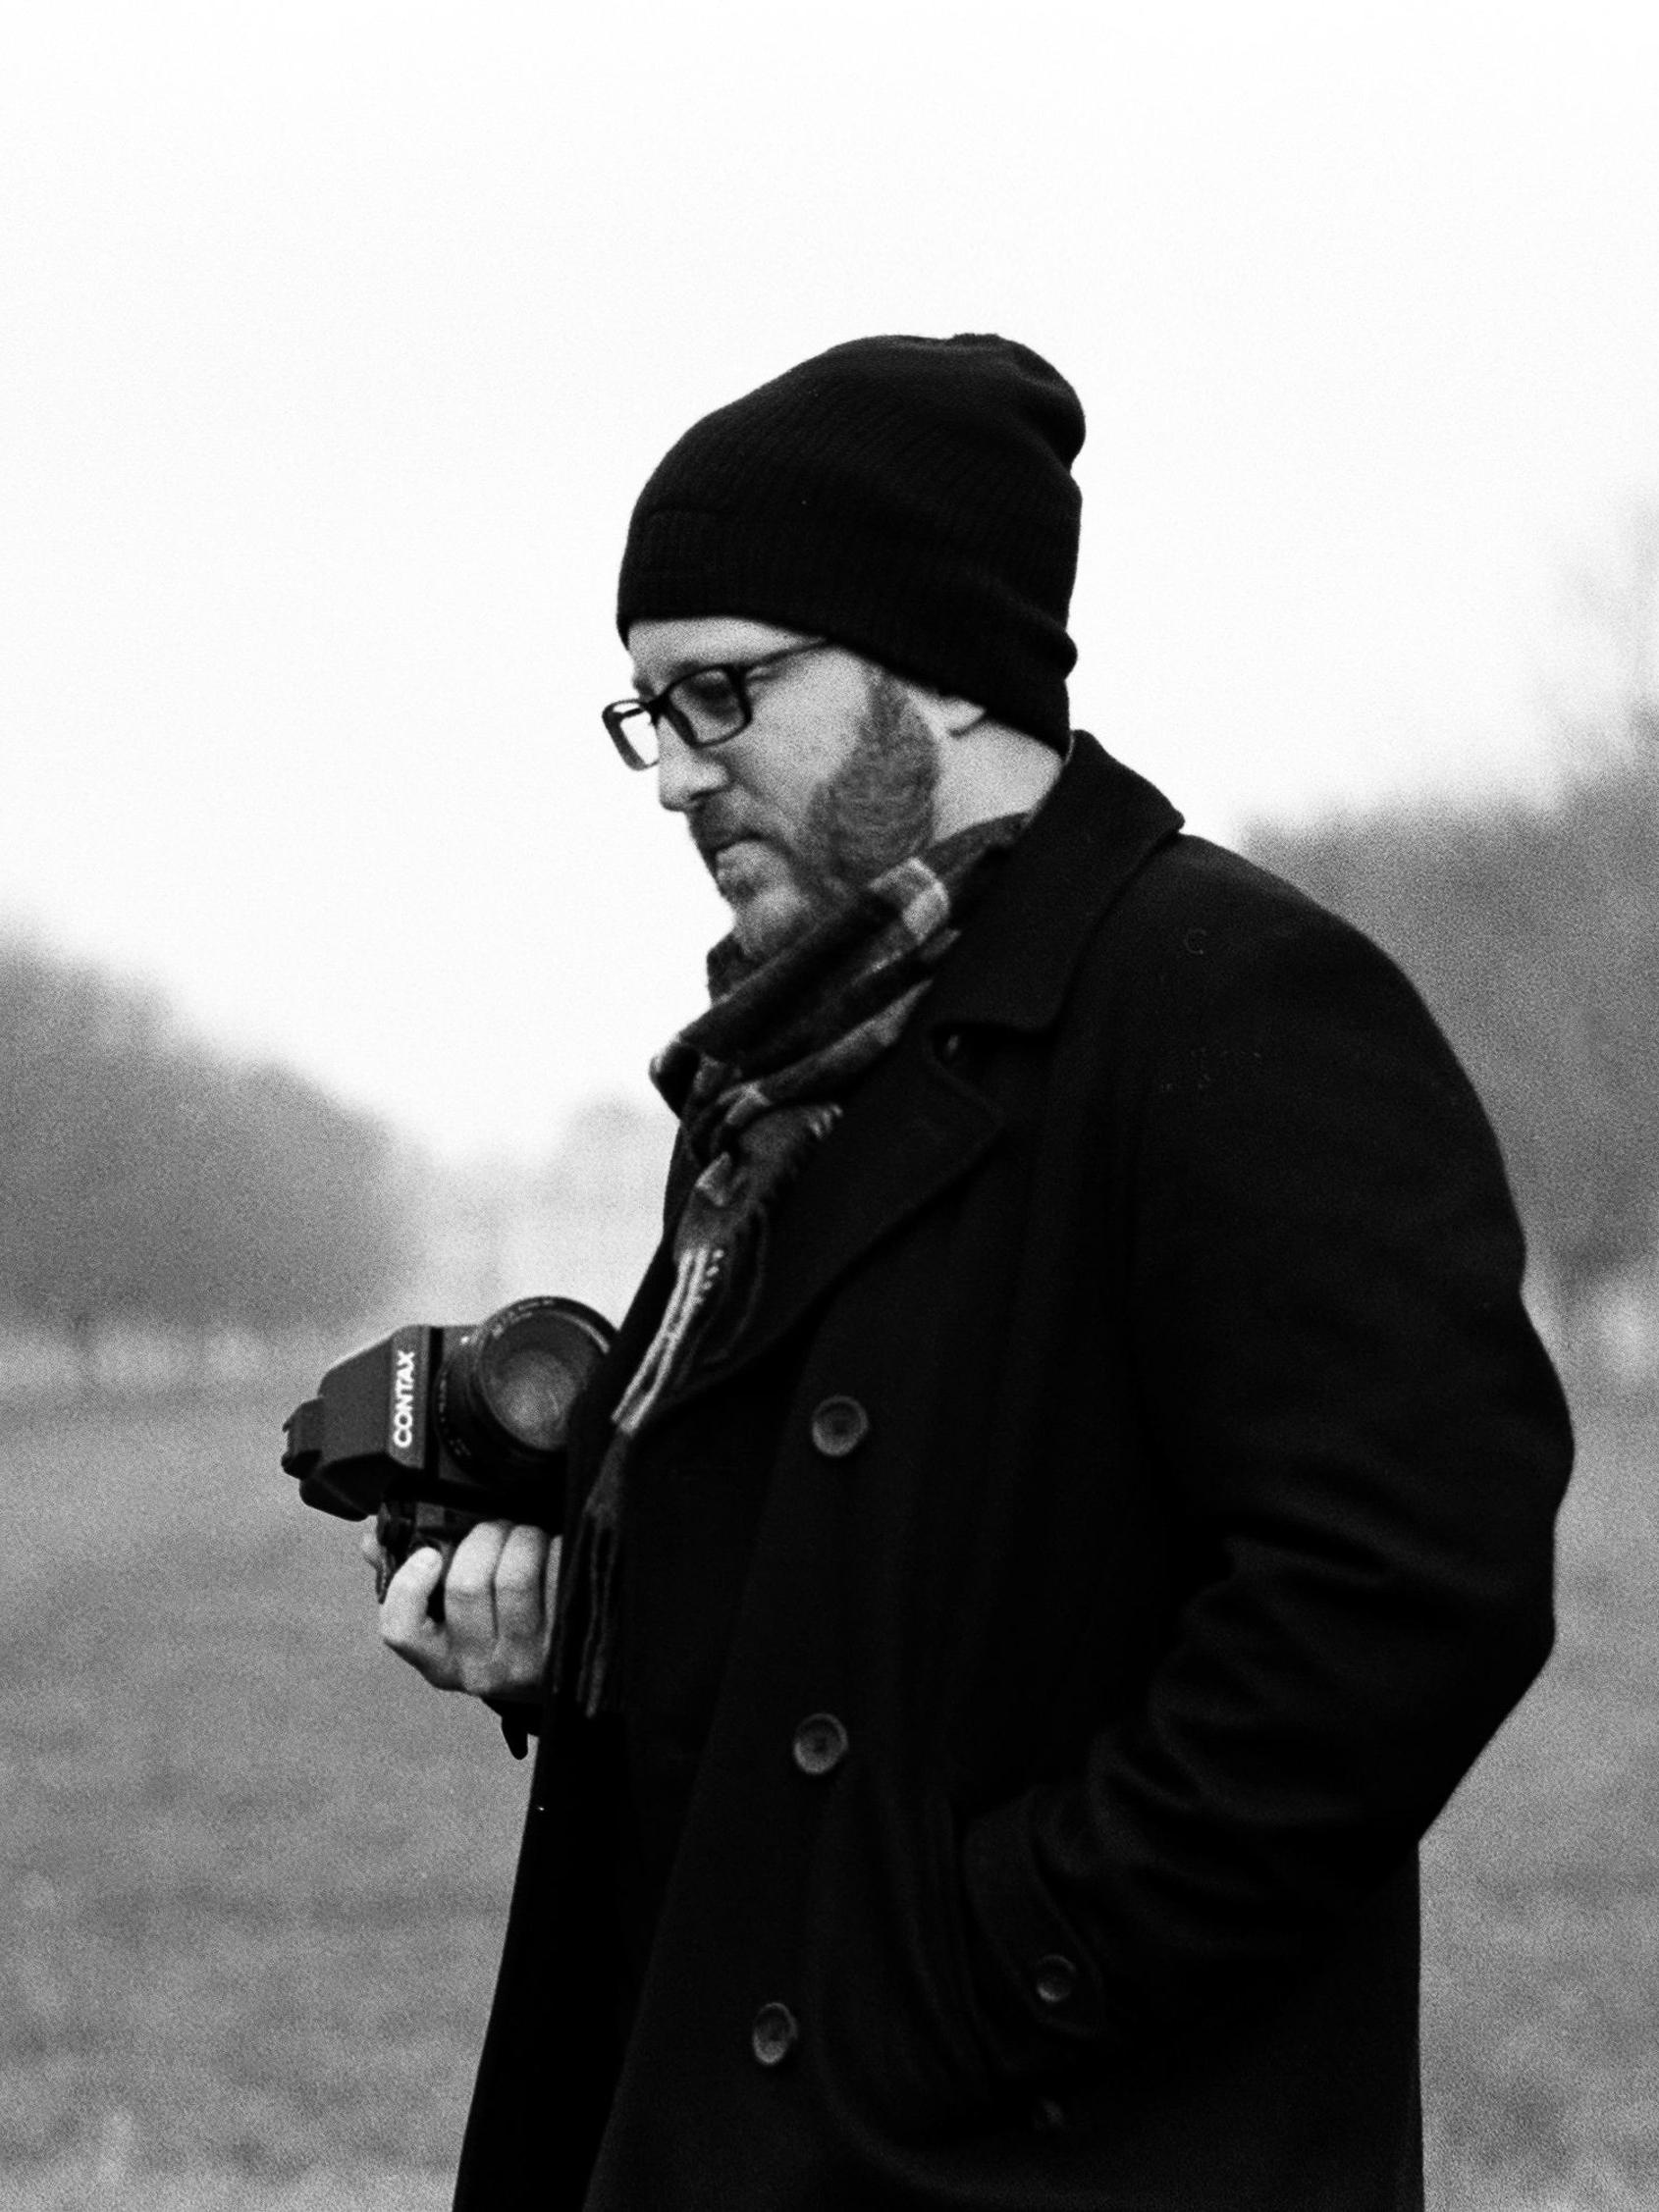 photo by Fernando Lutterbach